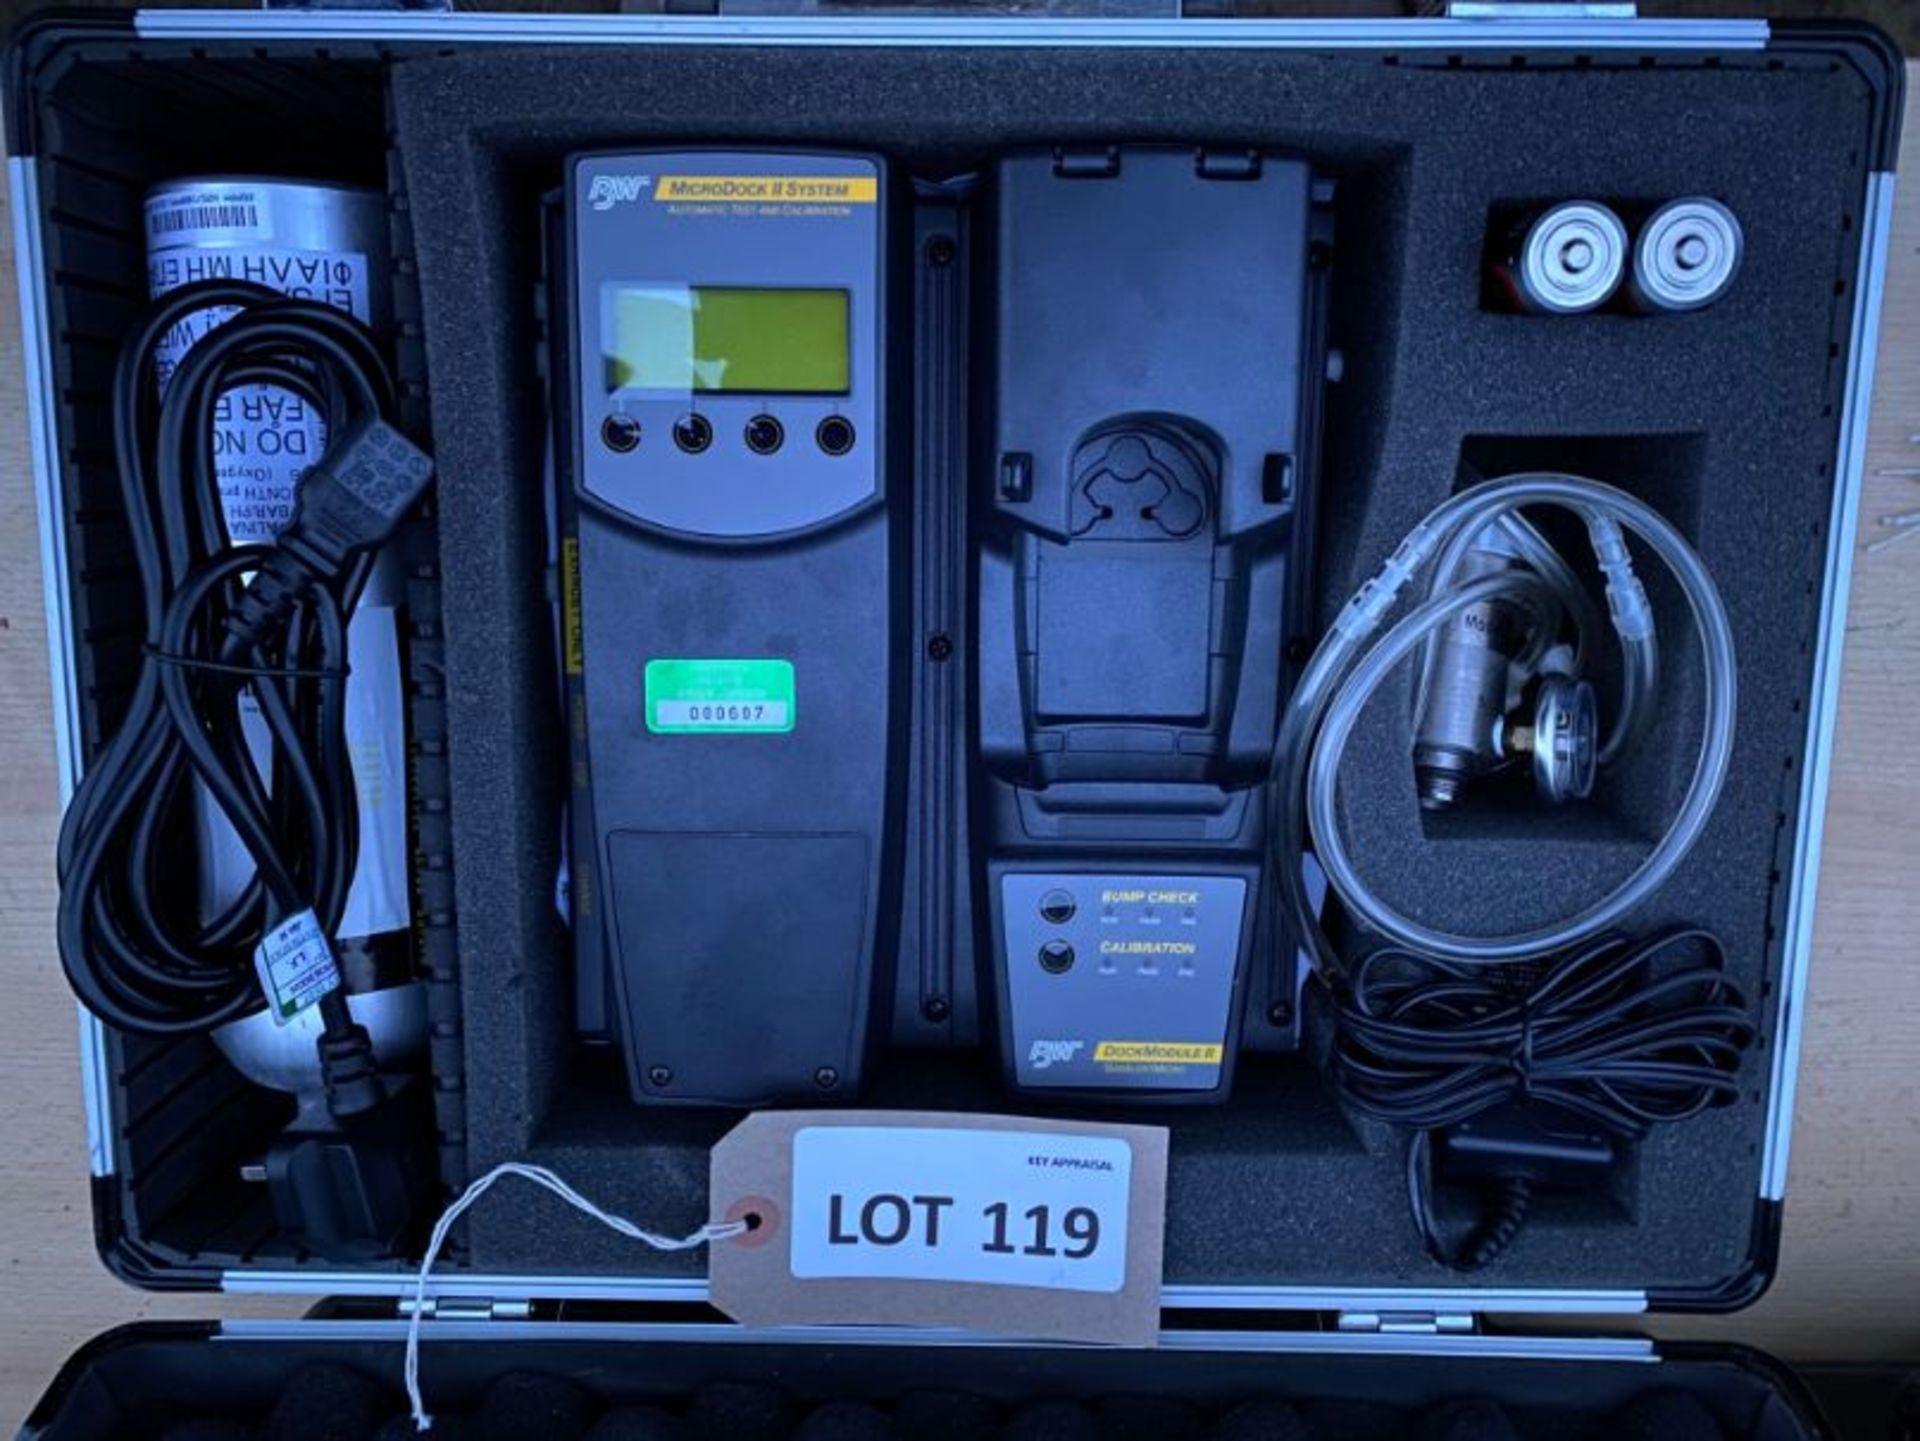 Lot 119 - BW Microdock II gas testing & calibration station (gas alert micro unit missing)